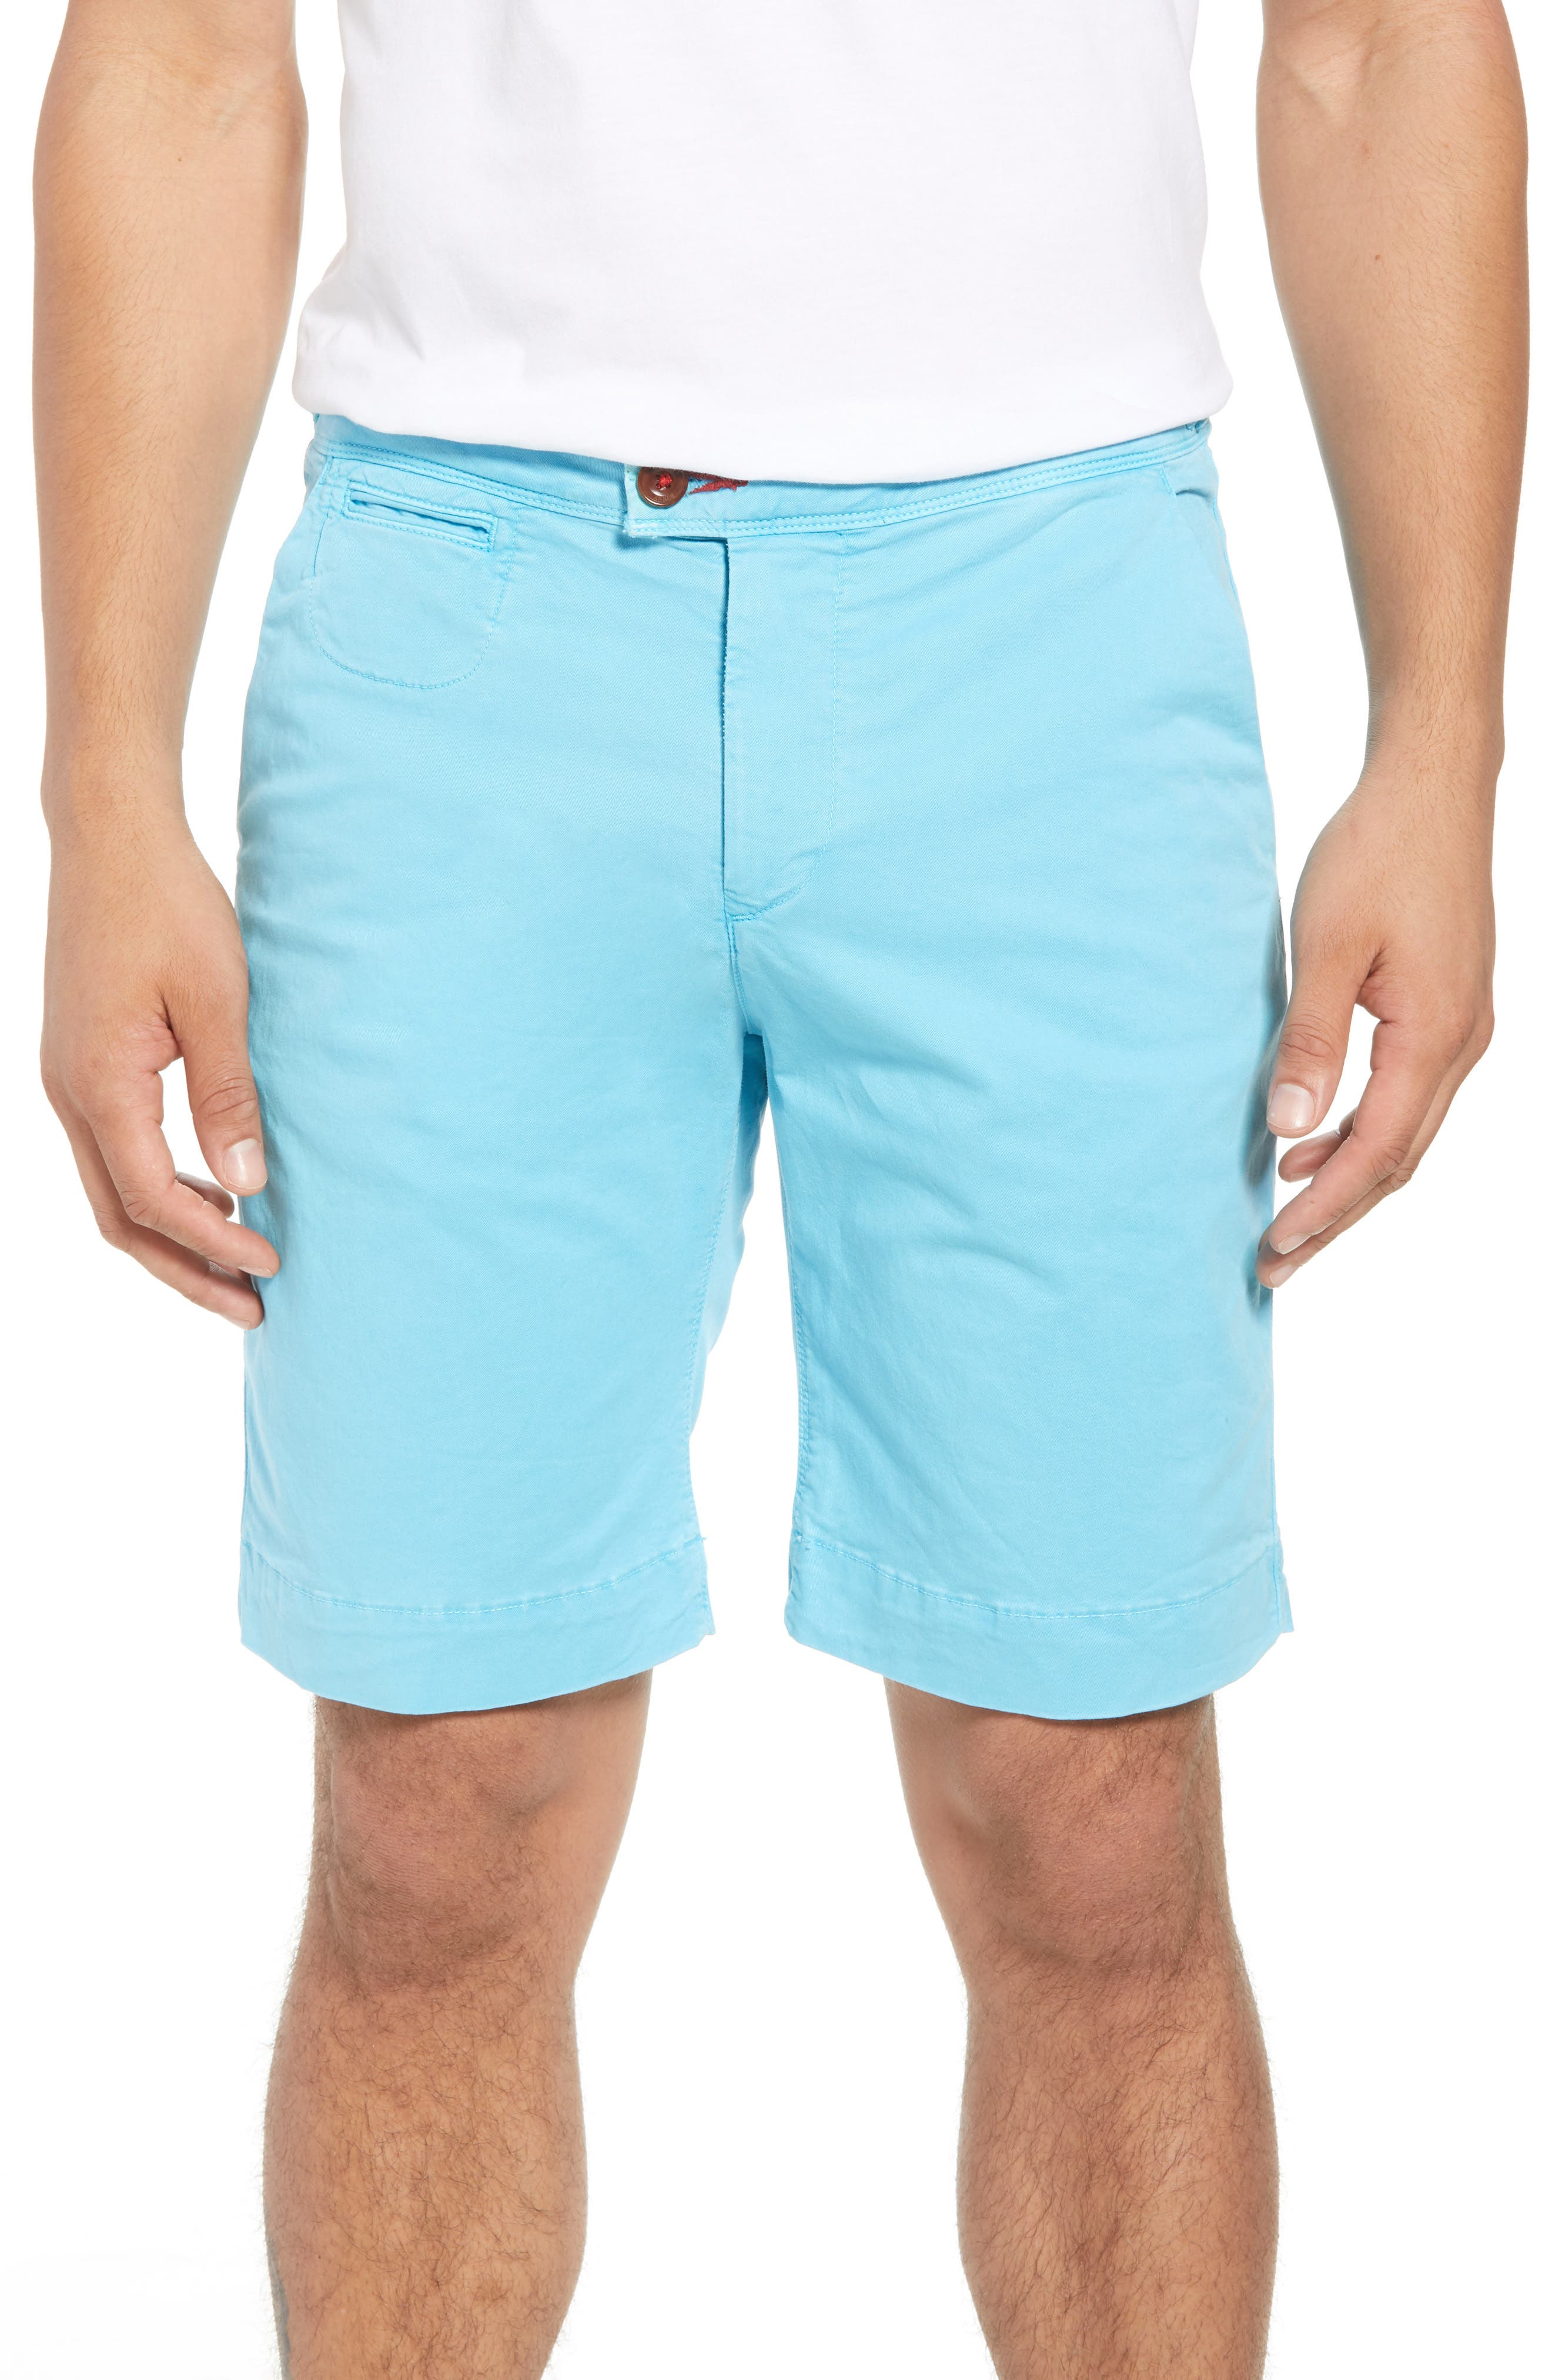 Triumph Shorts,                             Main thumbnail 9, color,